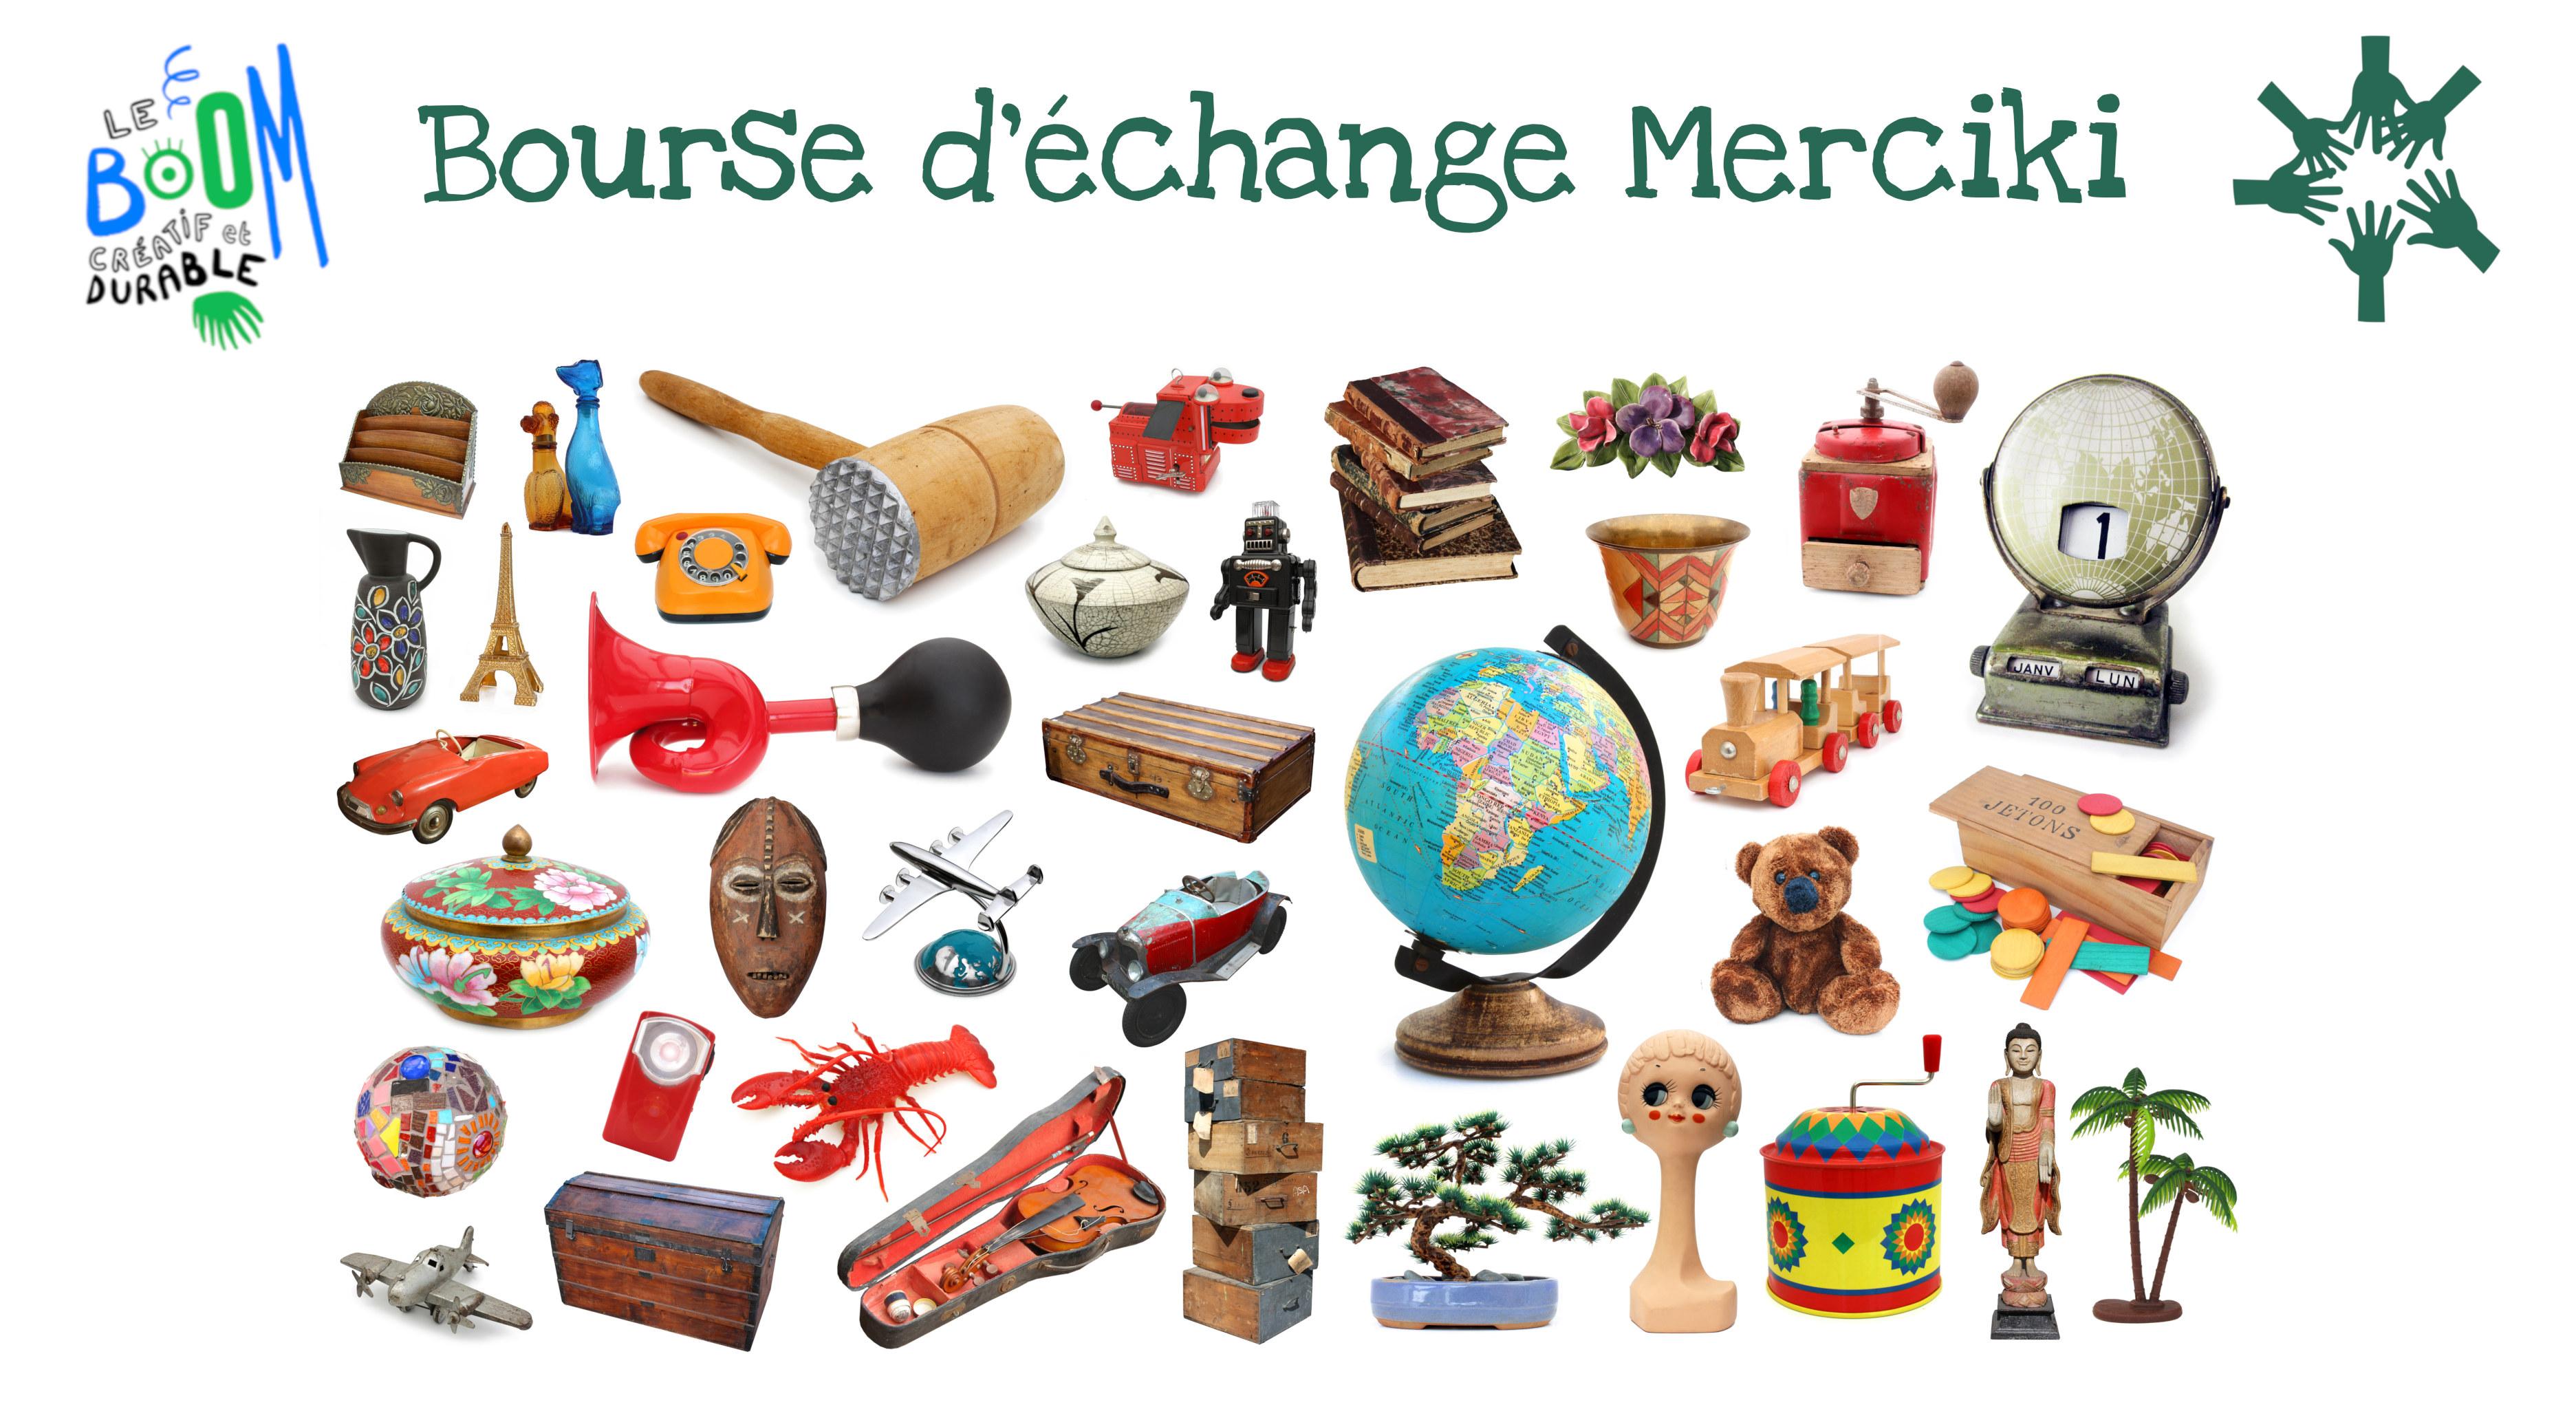 Bourse d'échange Merciki